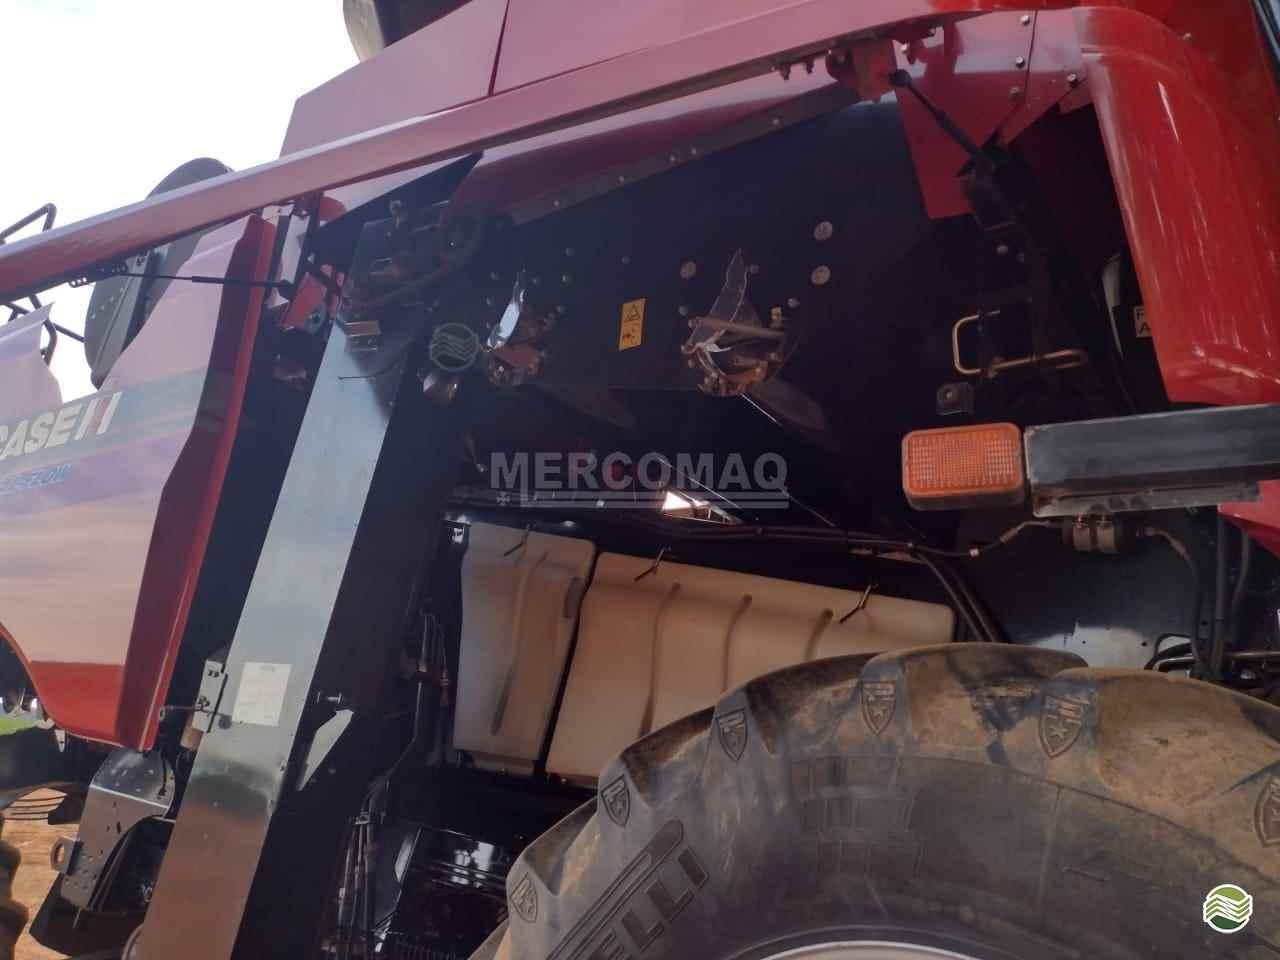 CASE CASE 7120  2014/2014 Mercomaq - JAN - GTS